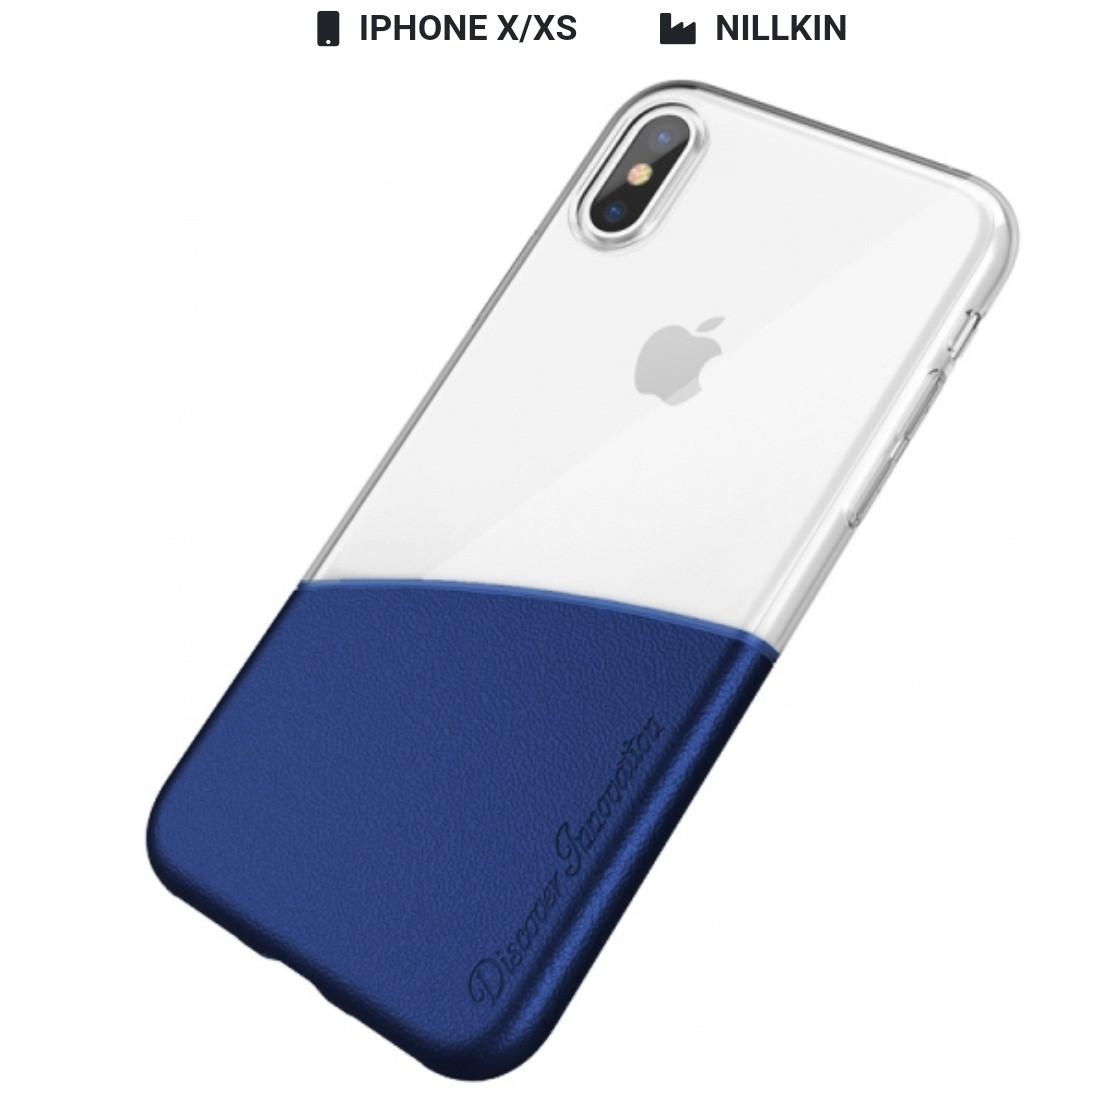 Захисний чохол Nillkin для iPhone X / iPhone XS Half Series Blue